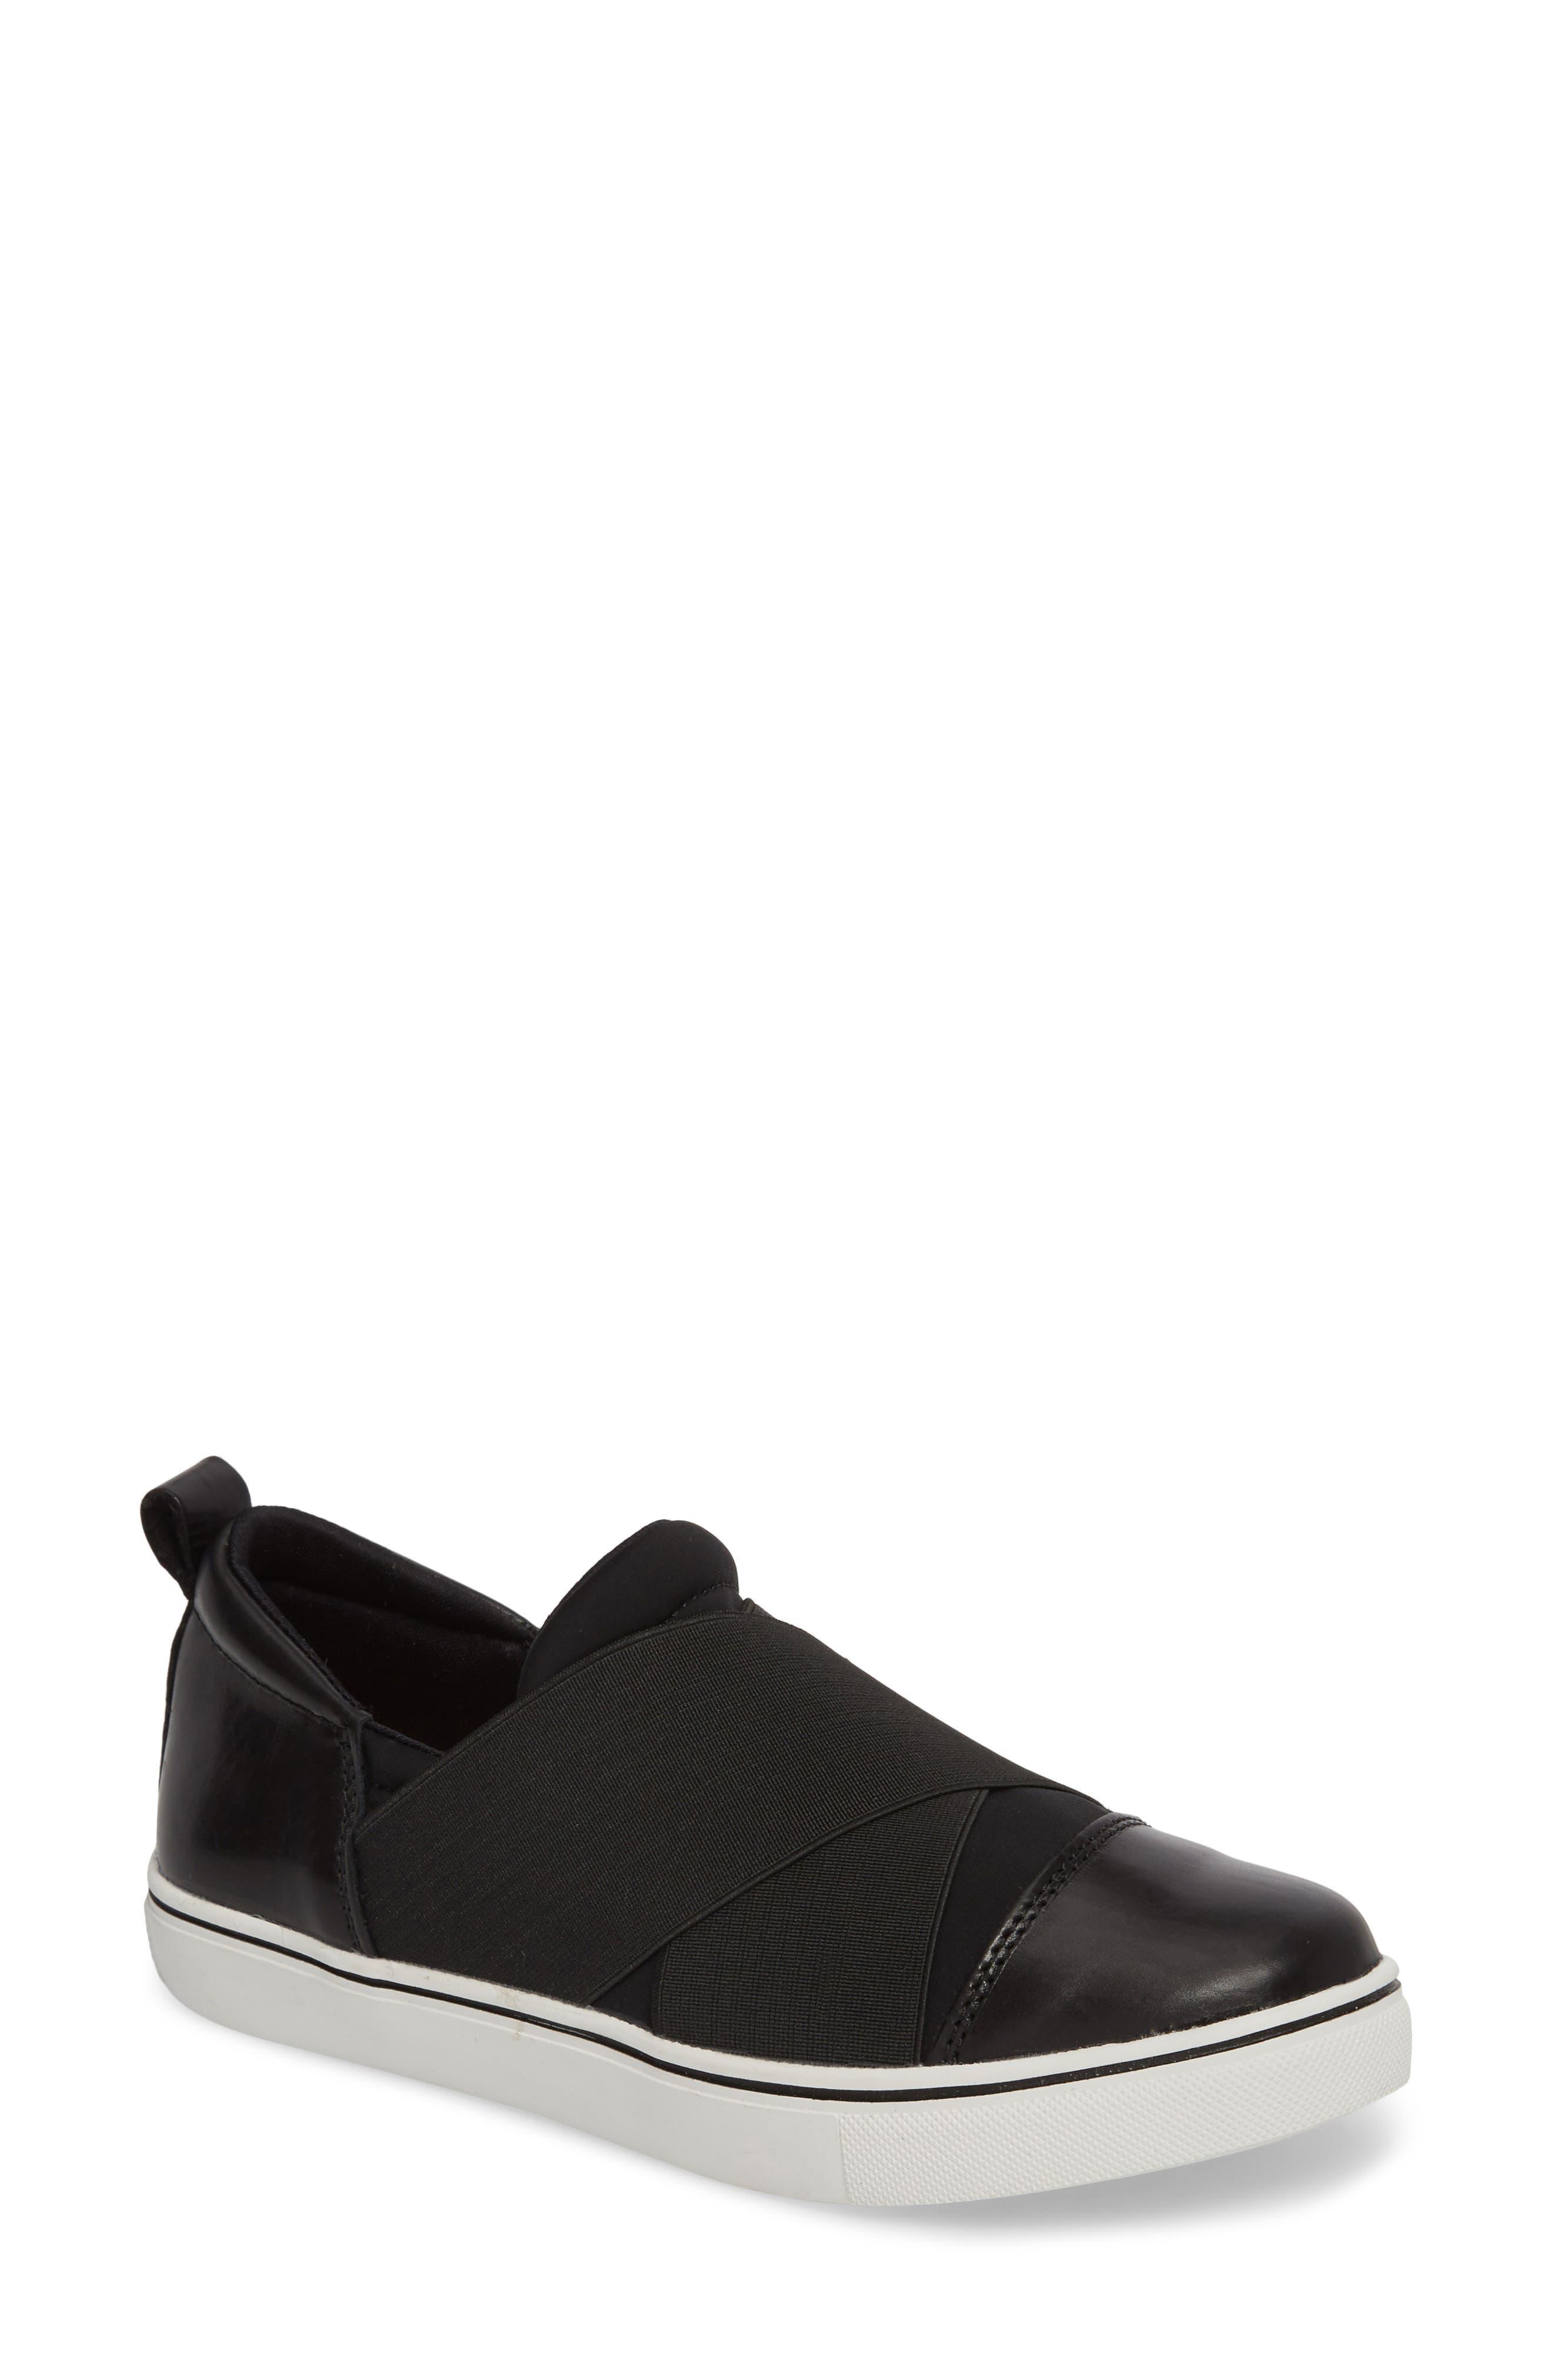 Elmwood Slip-On Sneaker,                             Main thumbnail 1, color,                             BLACK LEATHER